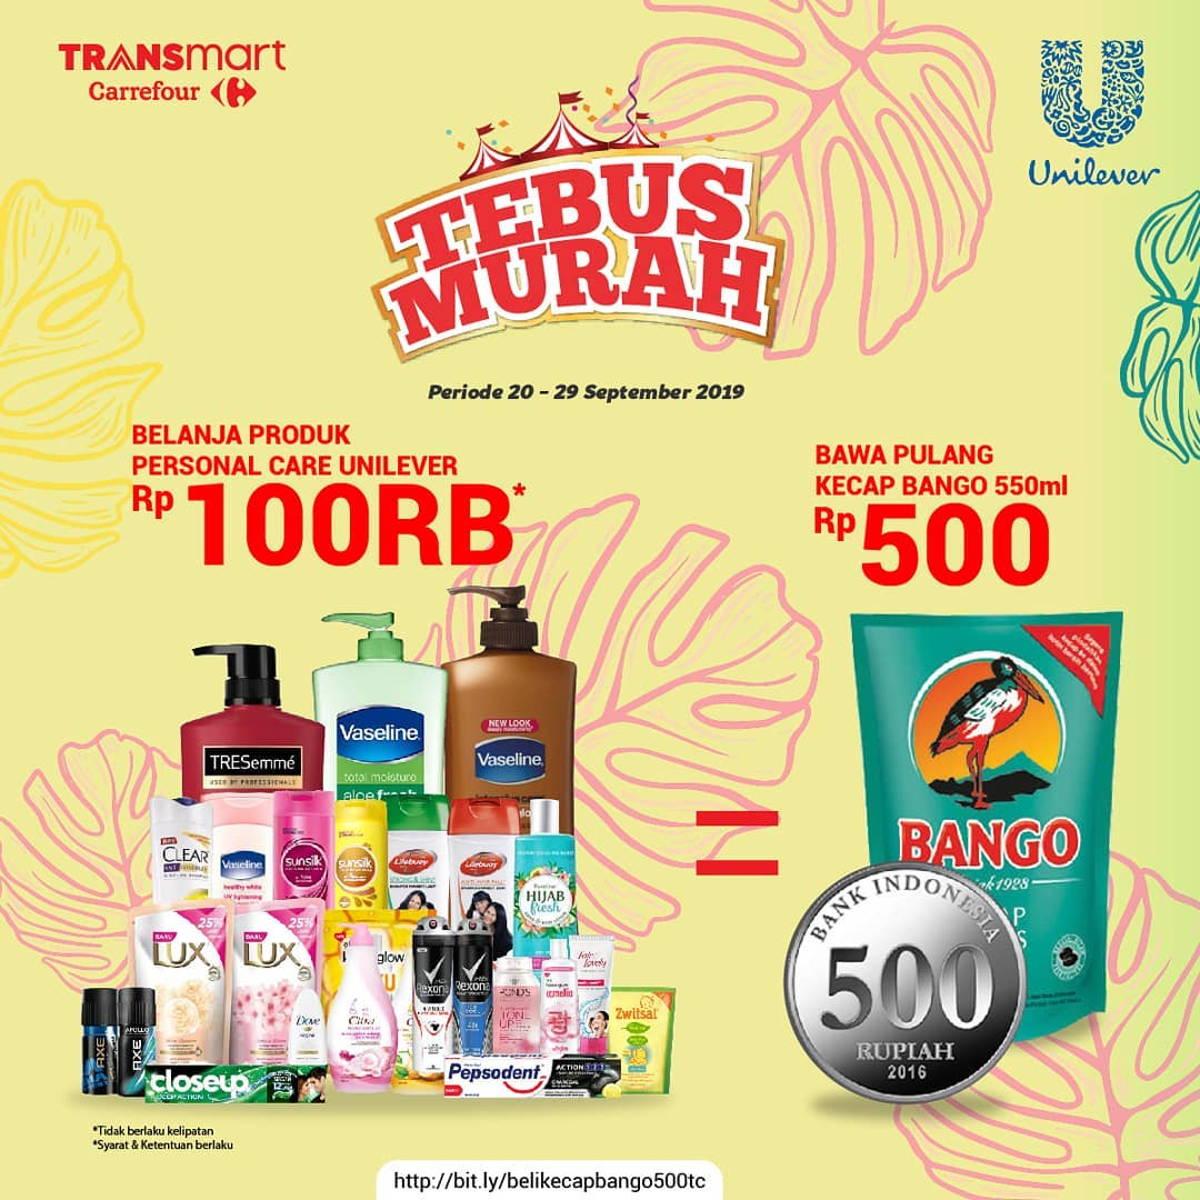 Katalog Promo: TRANSMART CARREFOUR: Promo TEBUS MURAH Minyak Goreng / Kecap Hanya Rp. 500 - 2